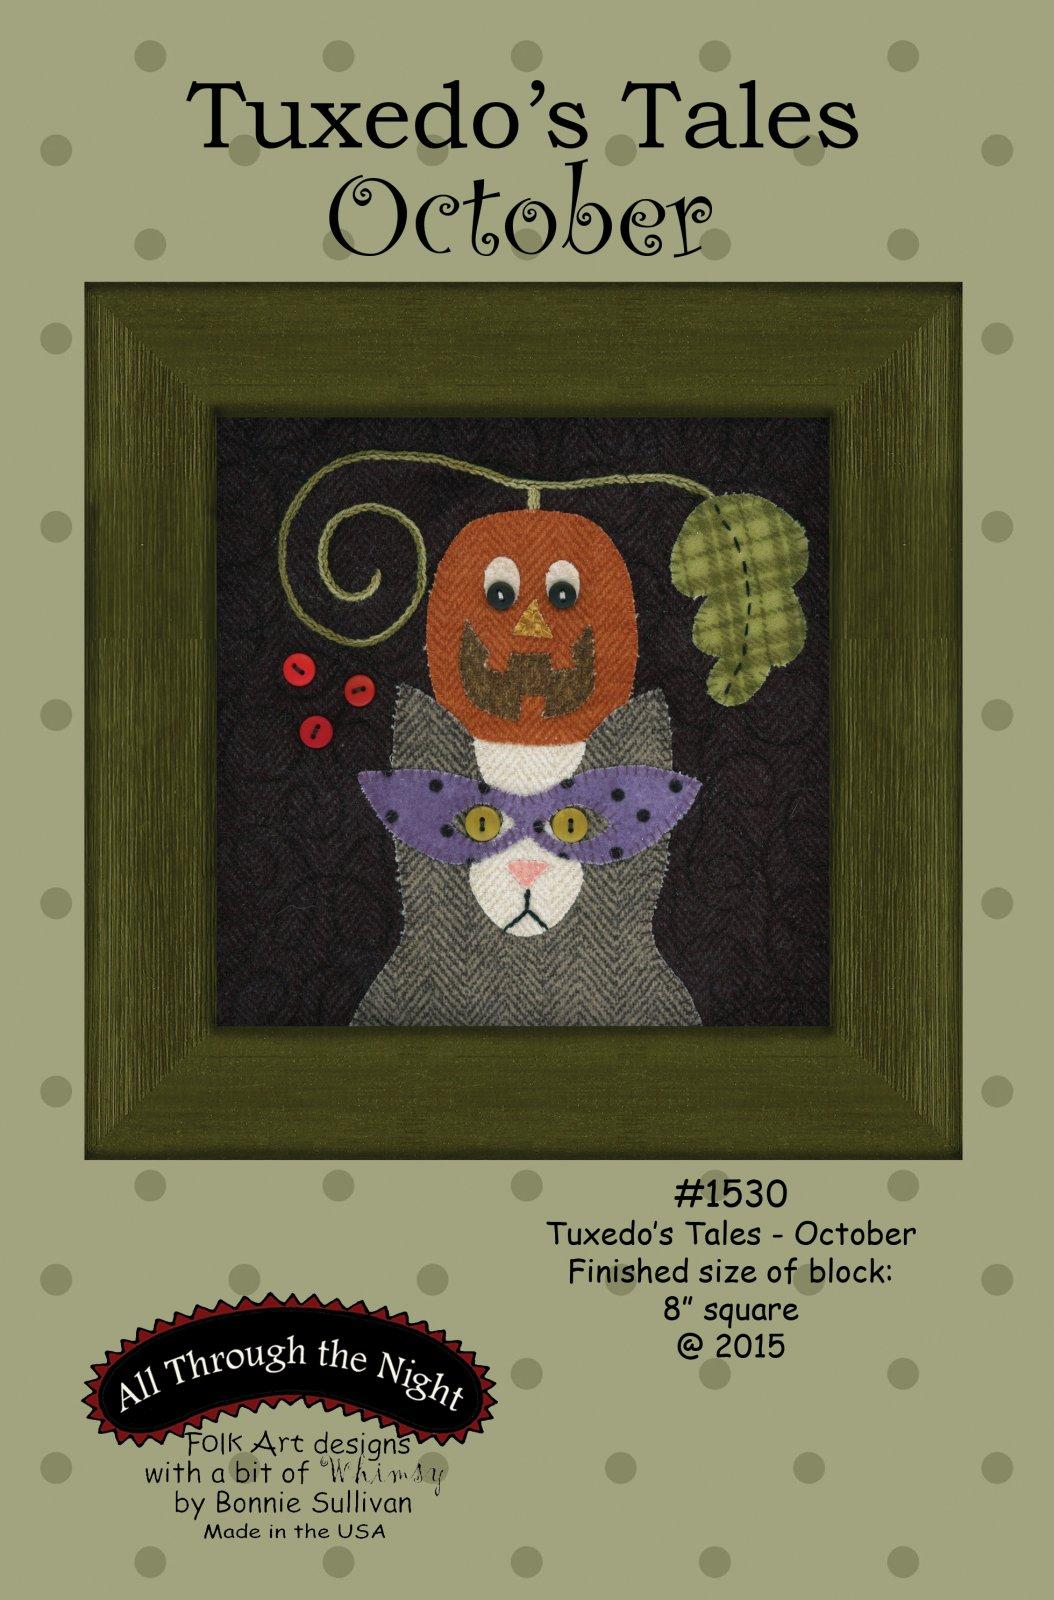 1530 Tuxedo's Tales October